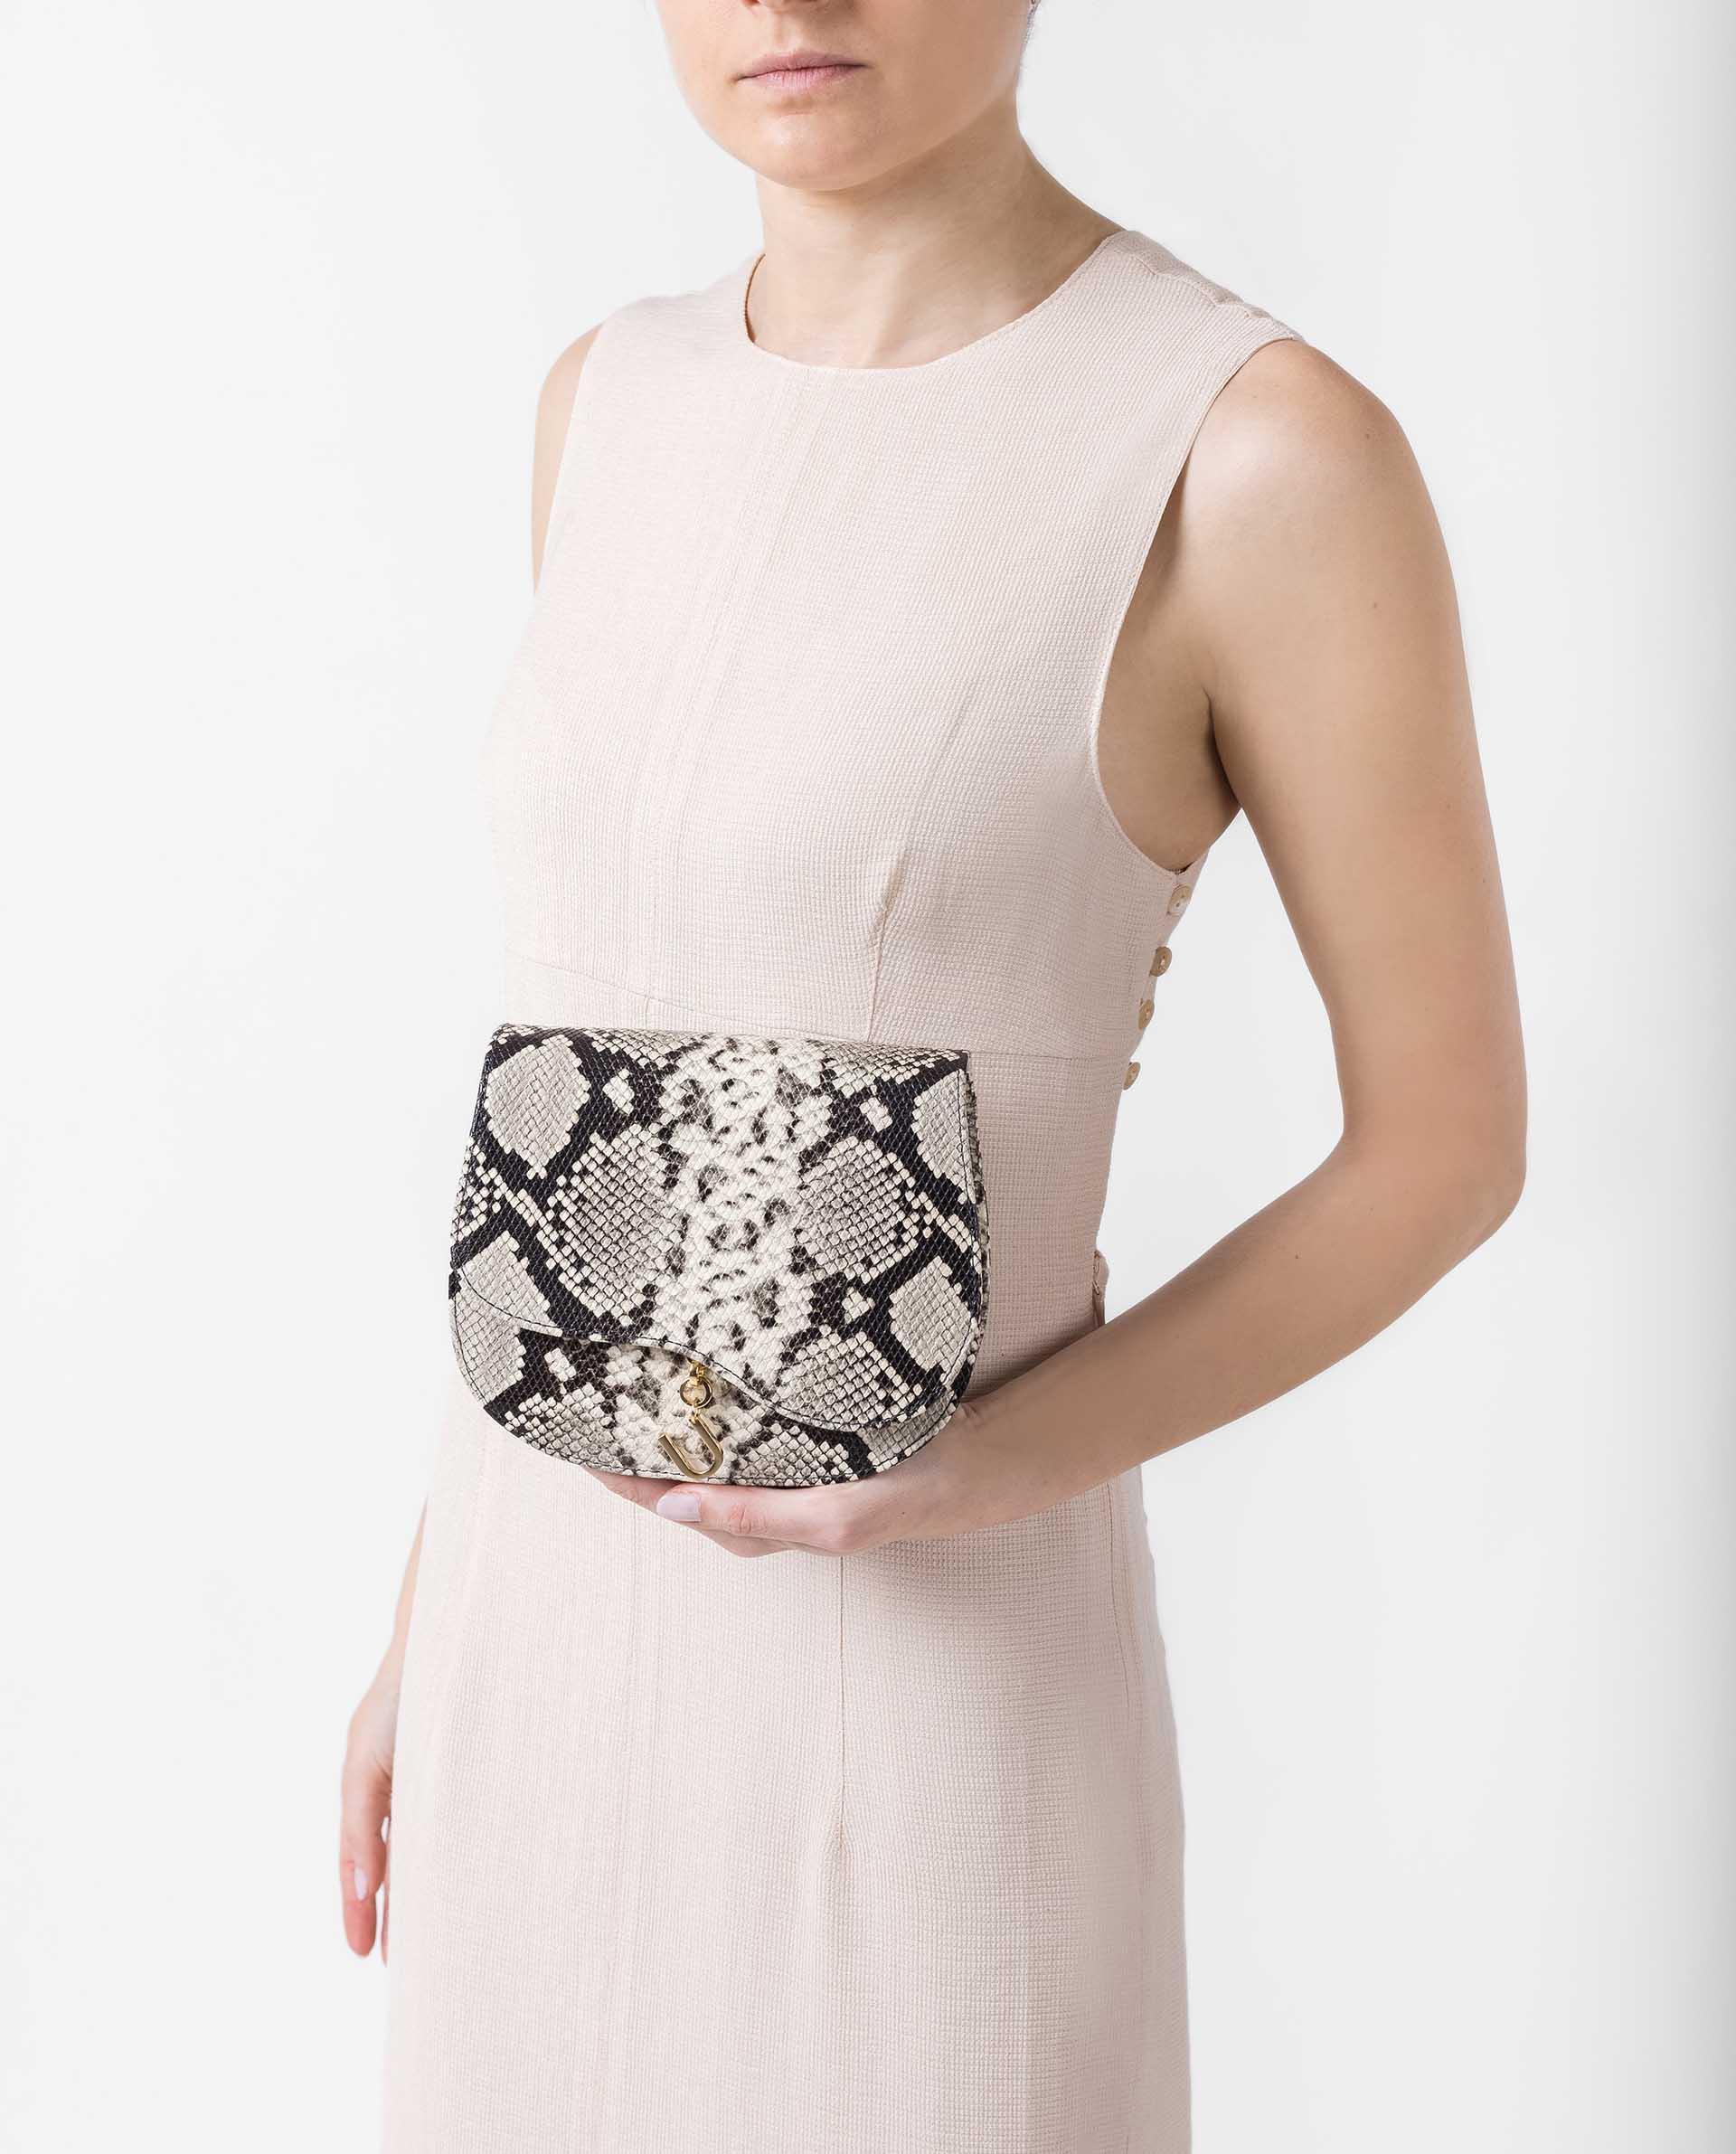 UNISA Lederhandtasche mit Snake-Print ZANIEL_VIP 5